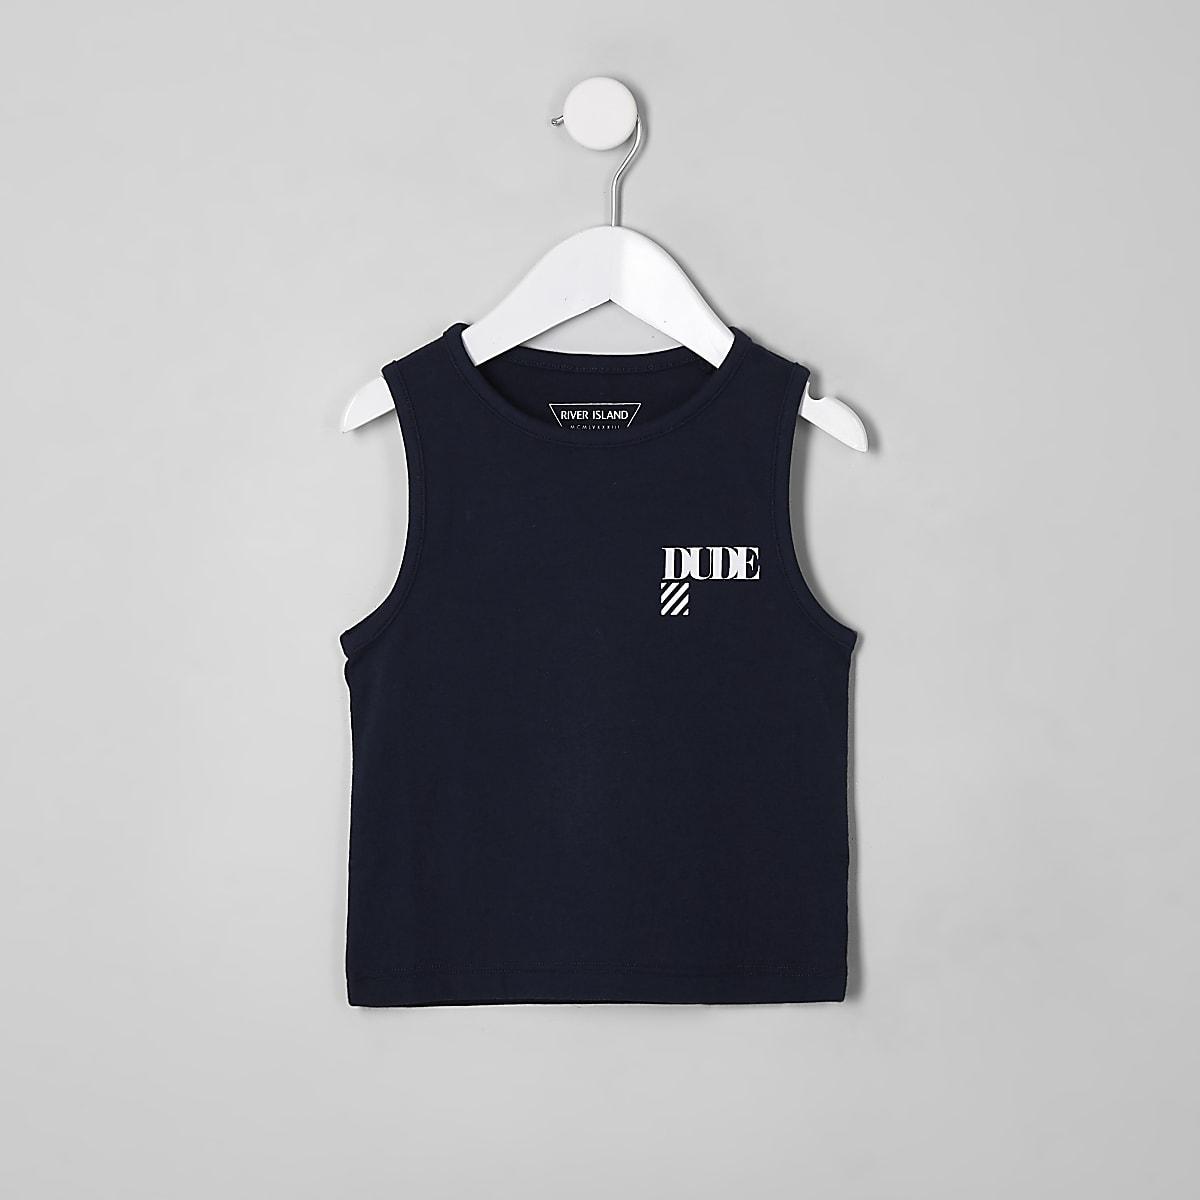 Mini boys navy 'Dude' vest